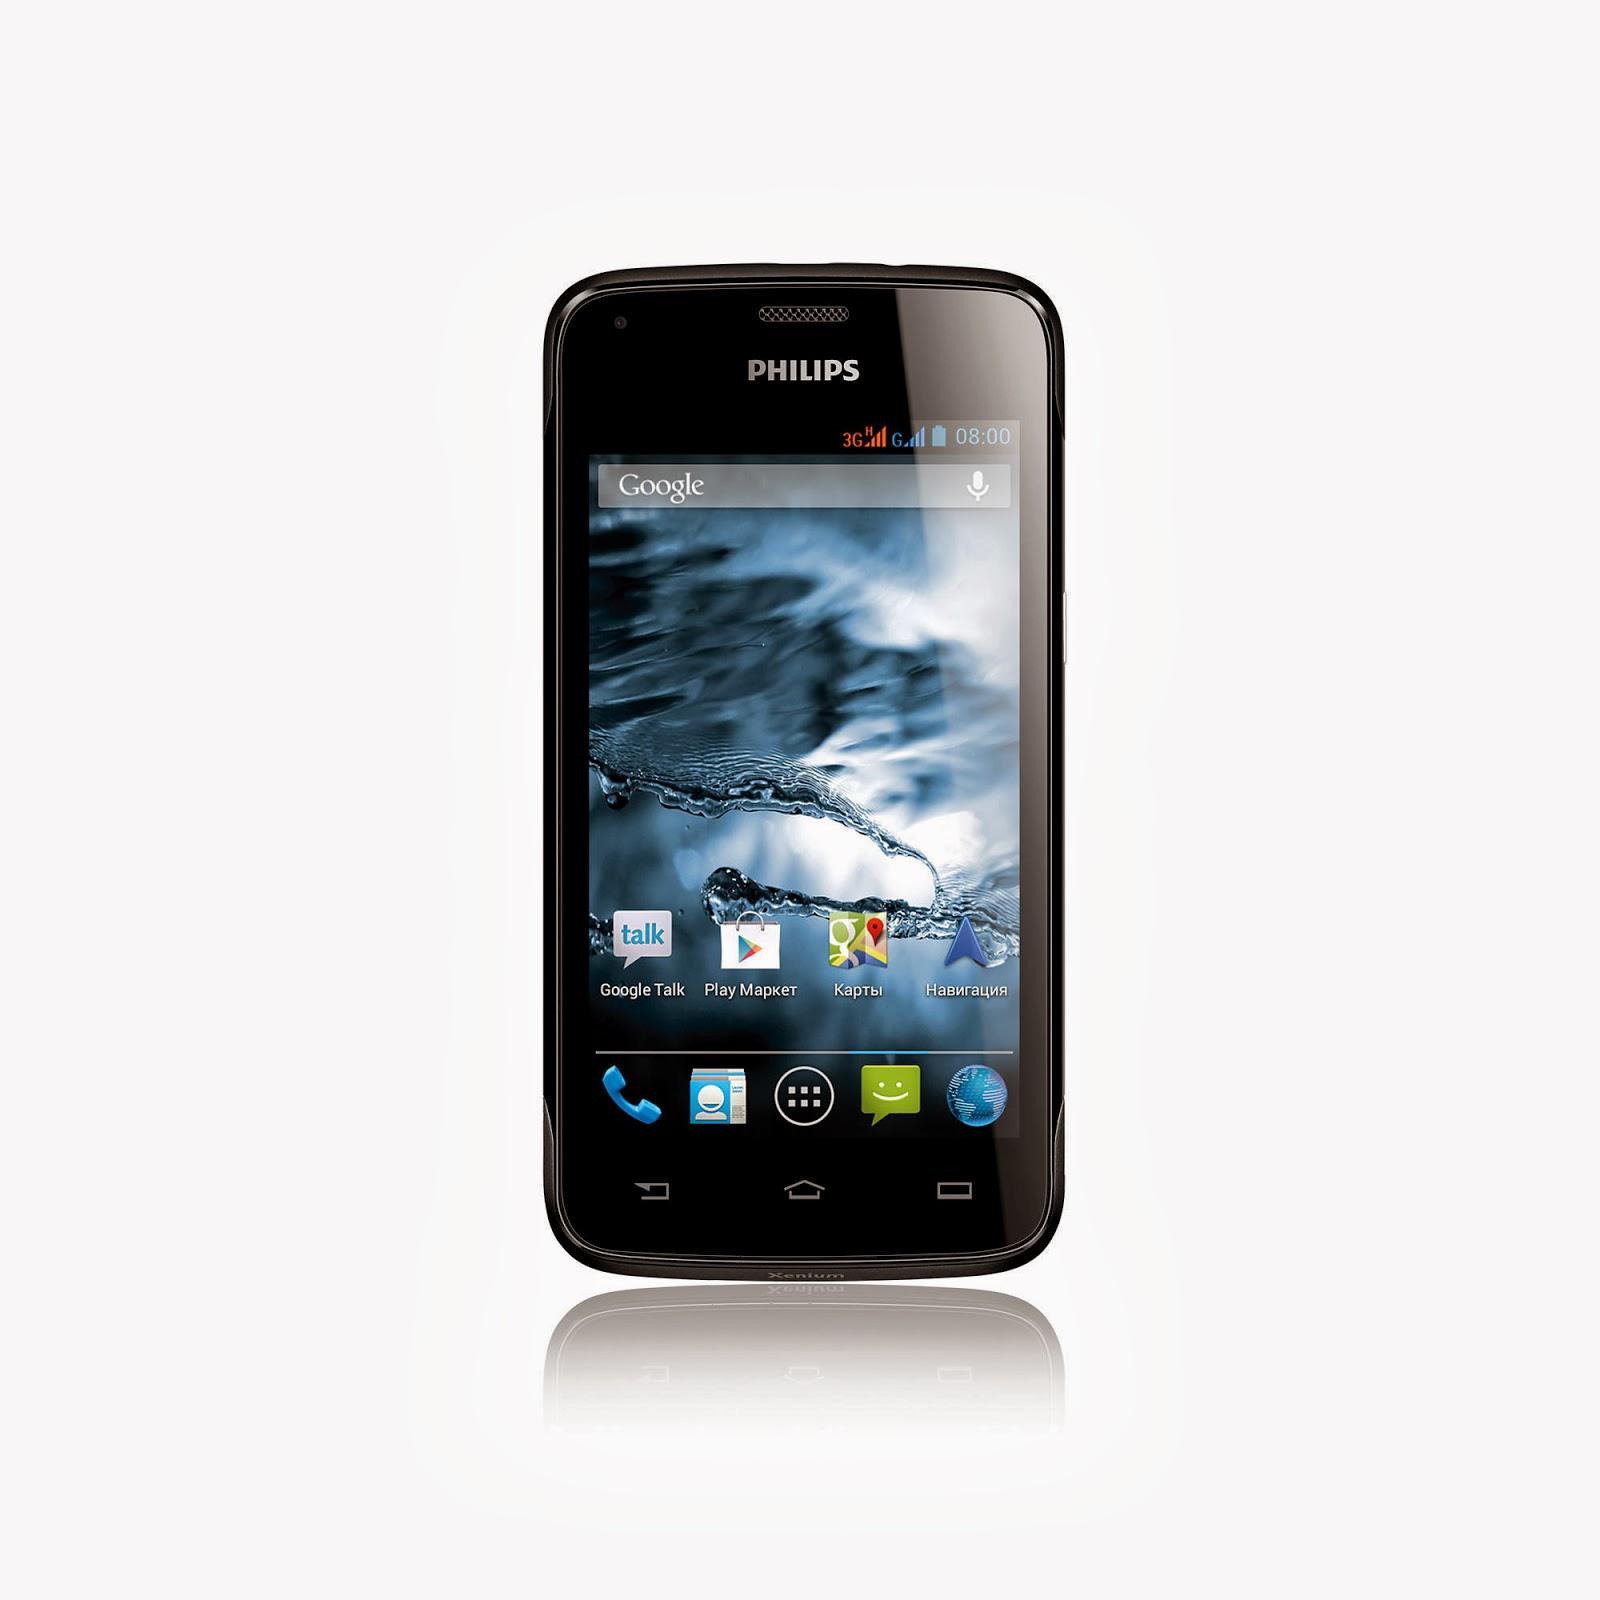 Philips Xenium W3568 Baterai Tahan 20 Hari Seputar Dunia Ponsel Dan Hp Polytron W6500 Quad Core Spesifikasi Smartphone